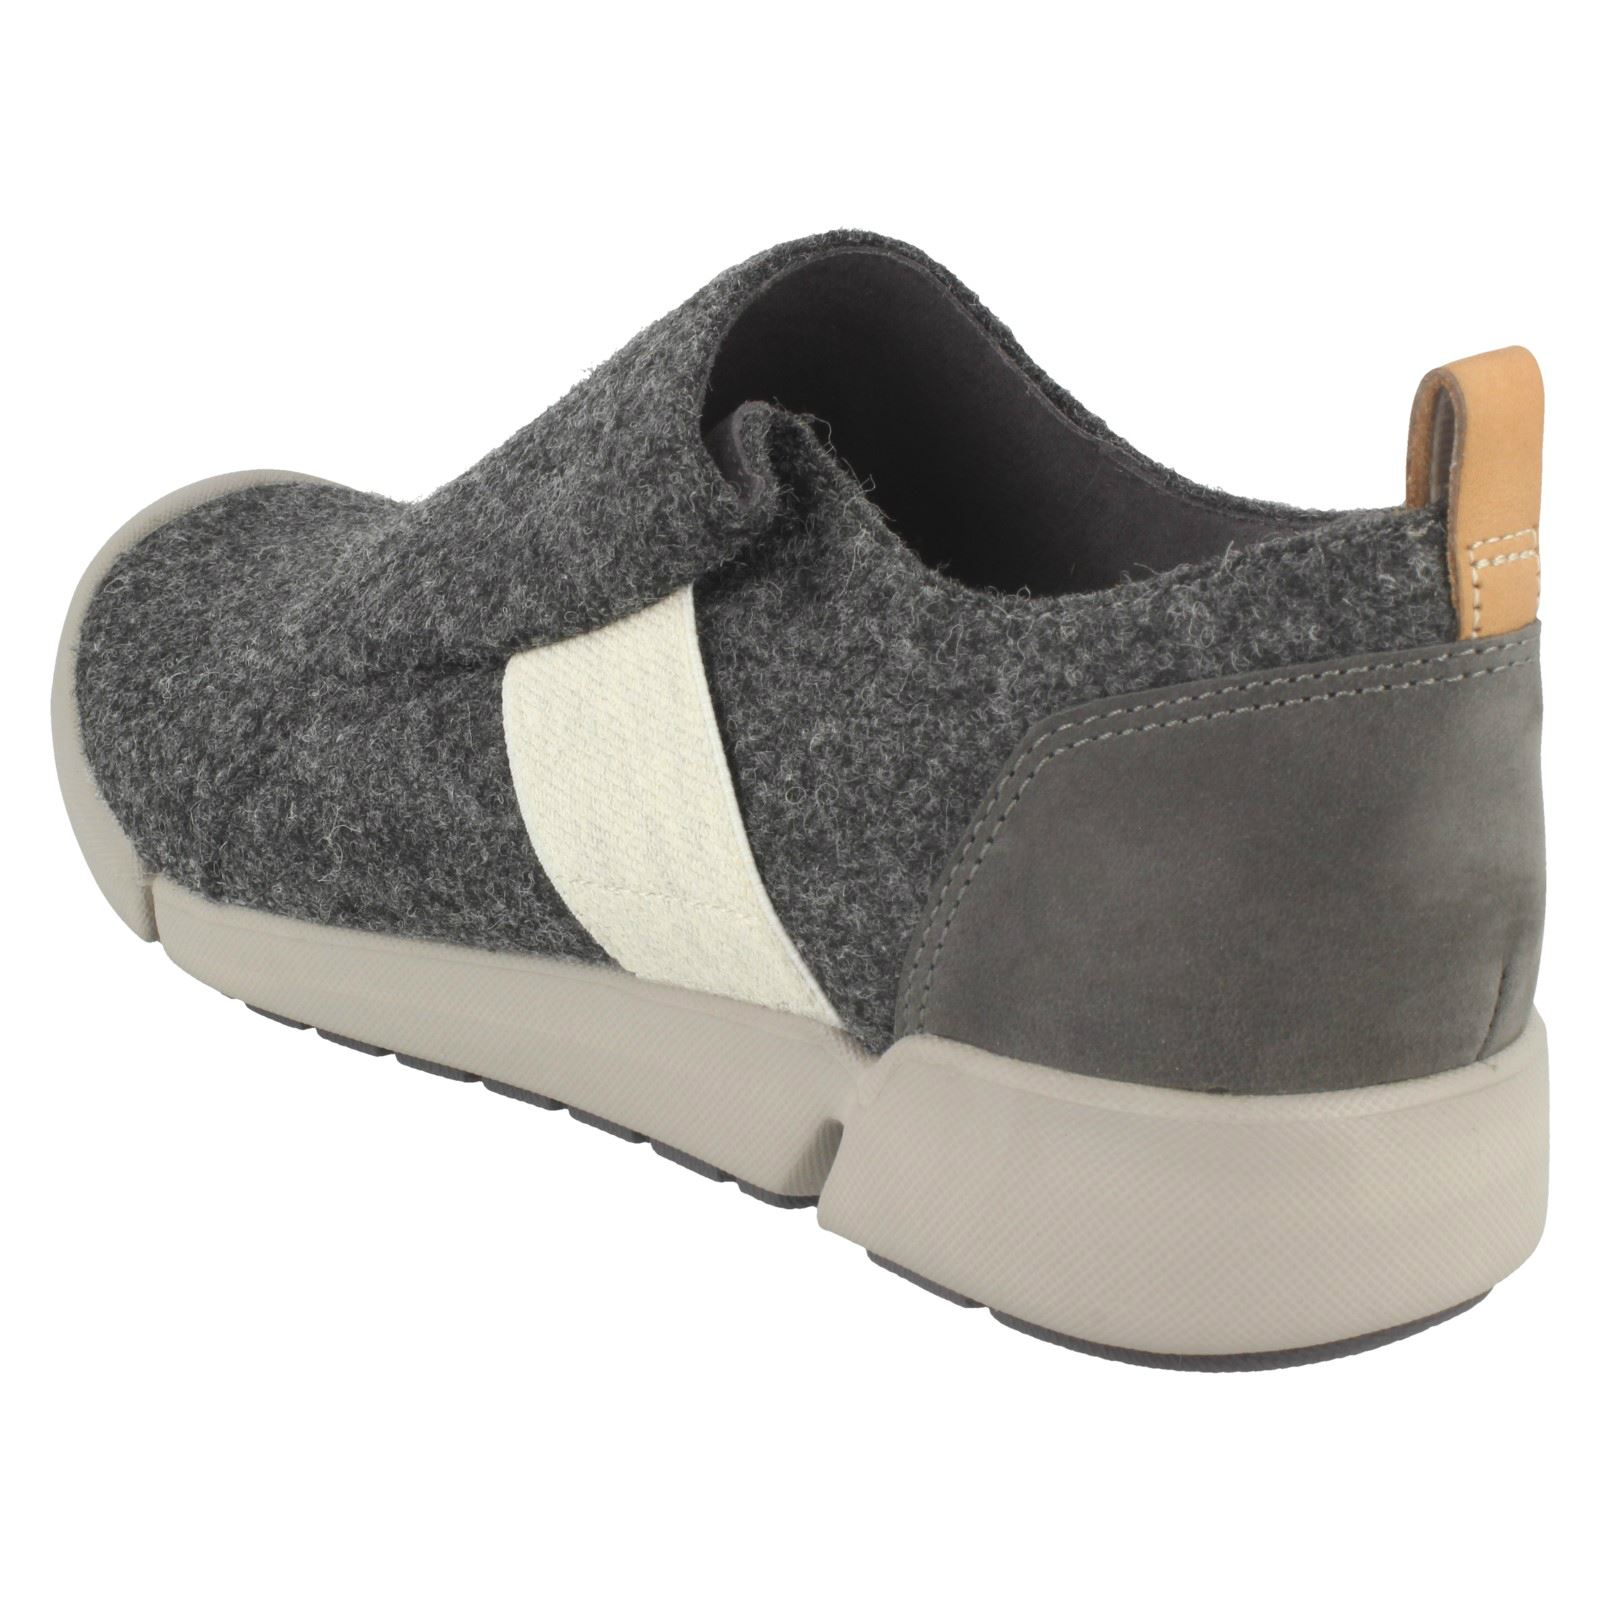 Damas Clarks zapatos  Lily Casuales De Tacón Alto Tri Lily  aa9678